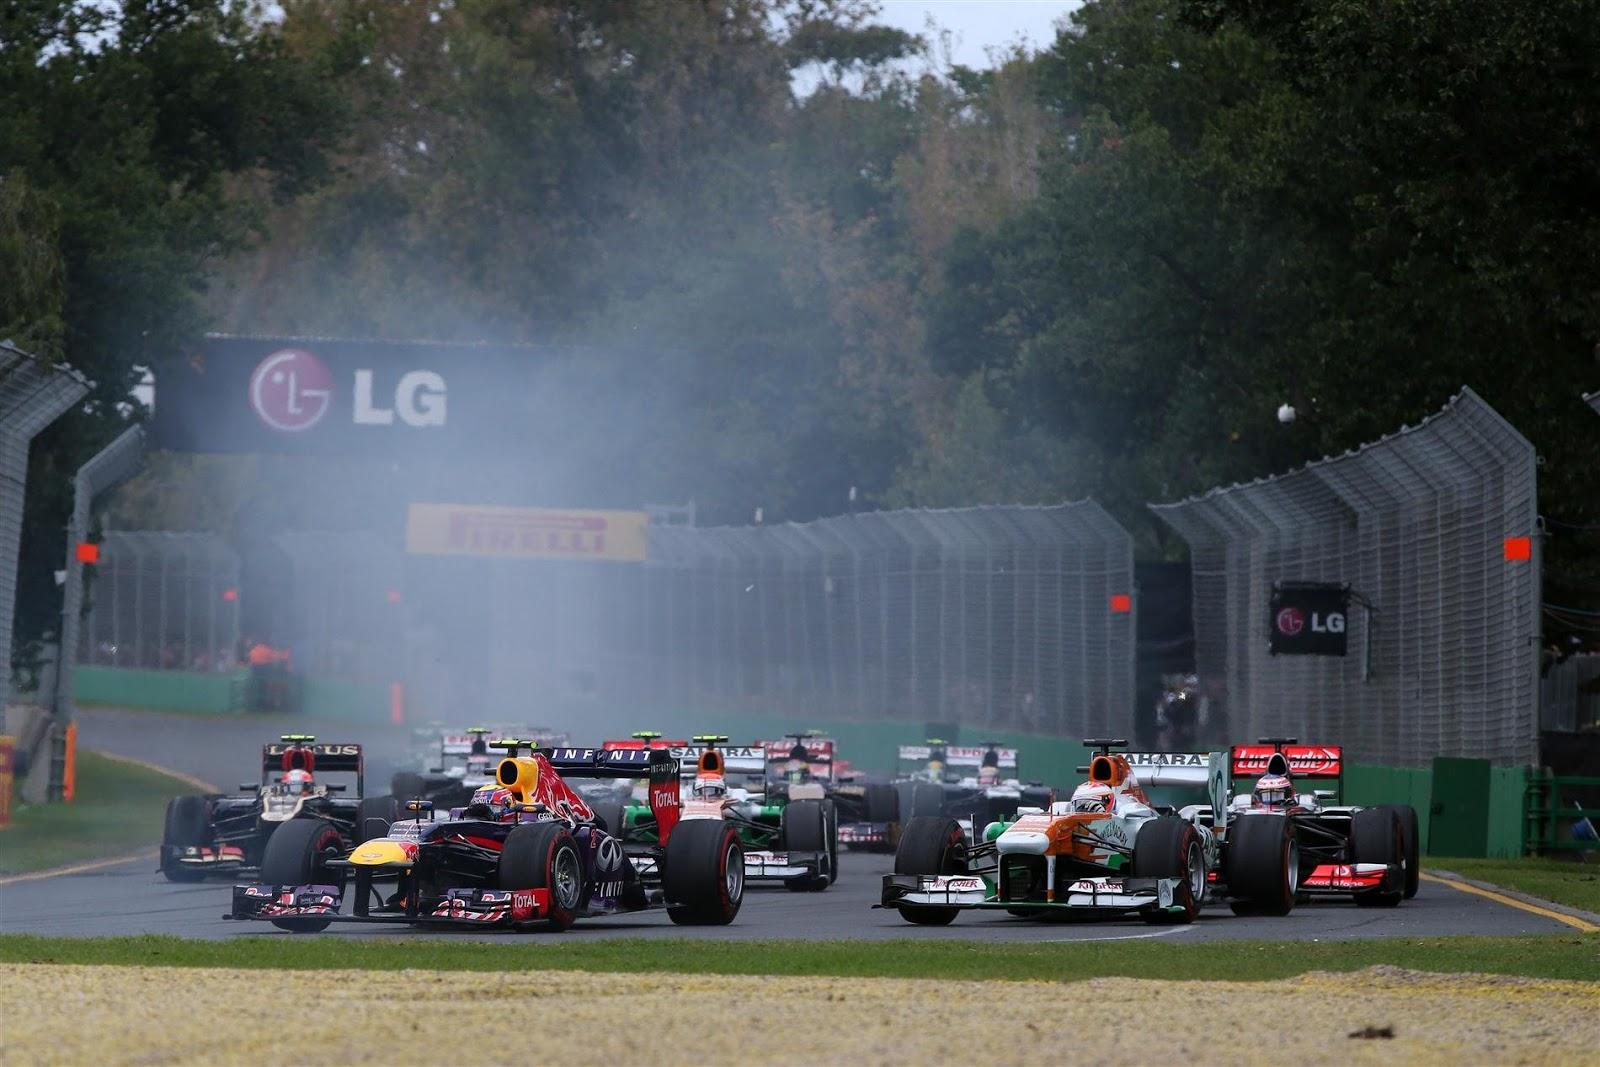 Blog de F1 de Eduardo Car: actualidad Fórmula 1, carreras GP ...